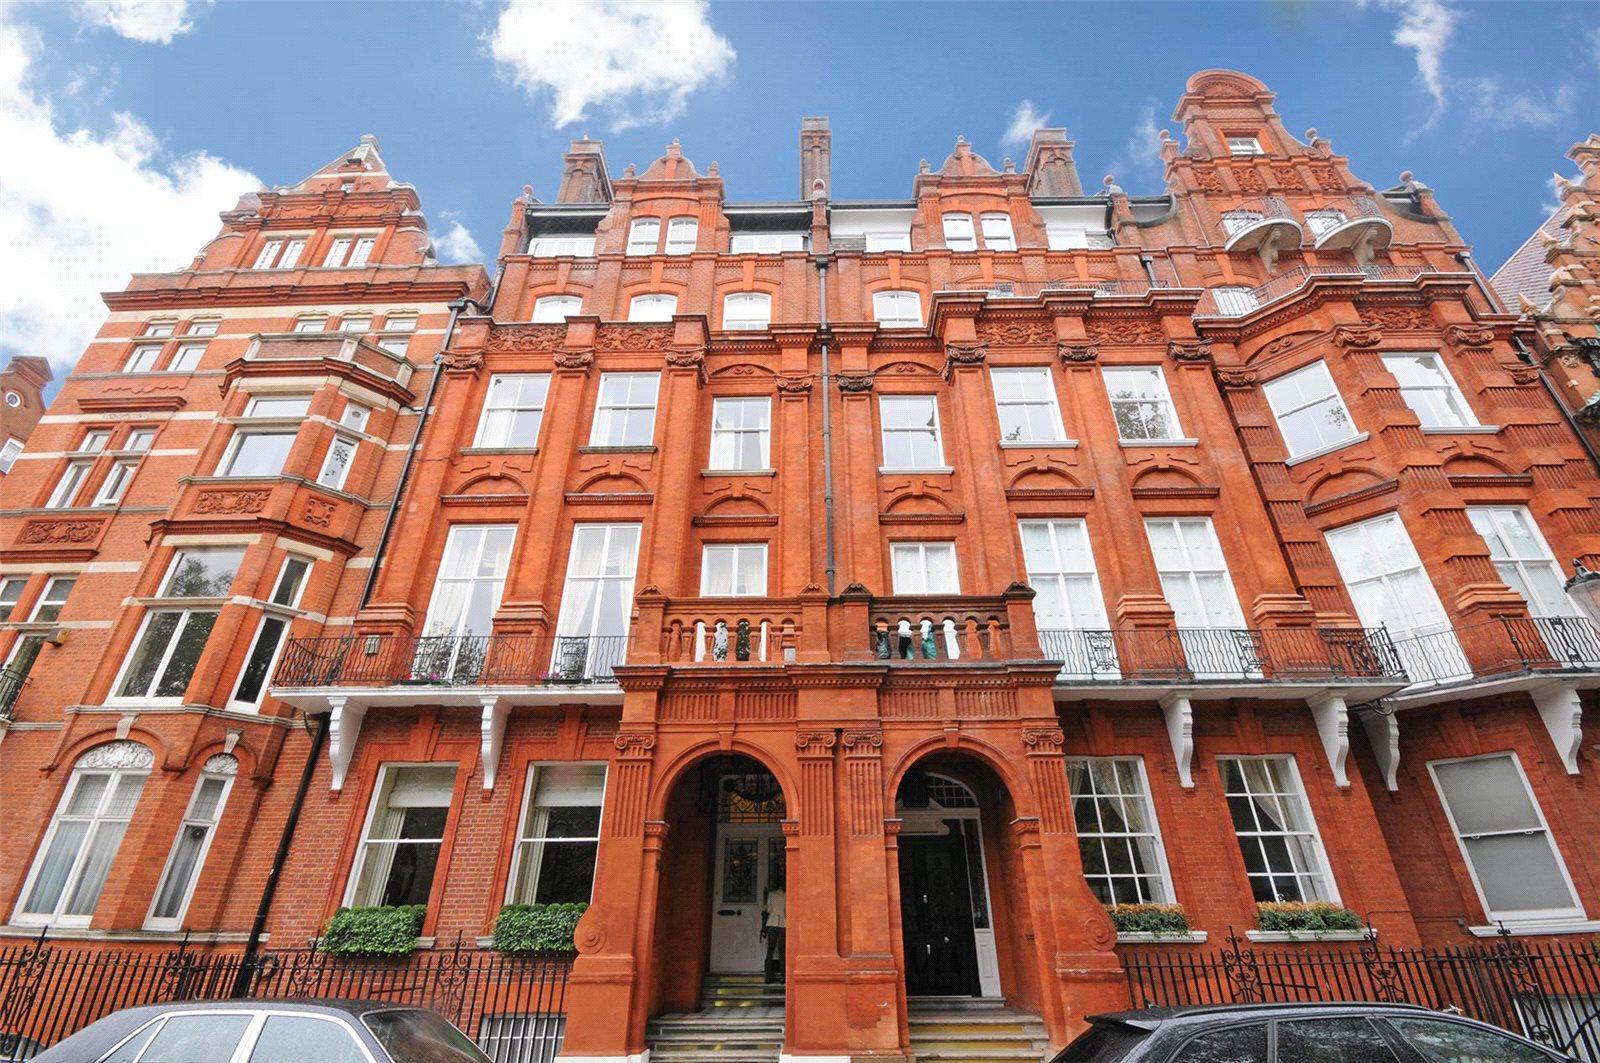 Knightsbridge Luxury Real Estate For Sale Christie 39 S